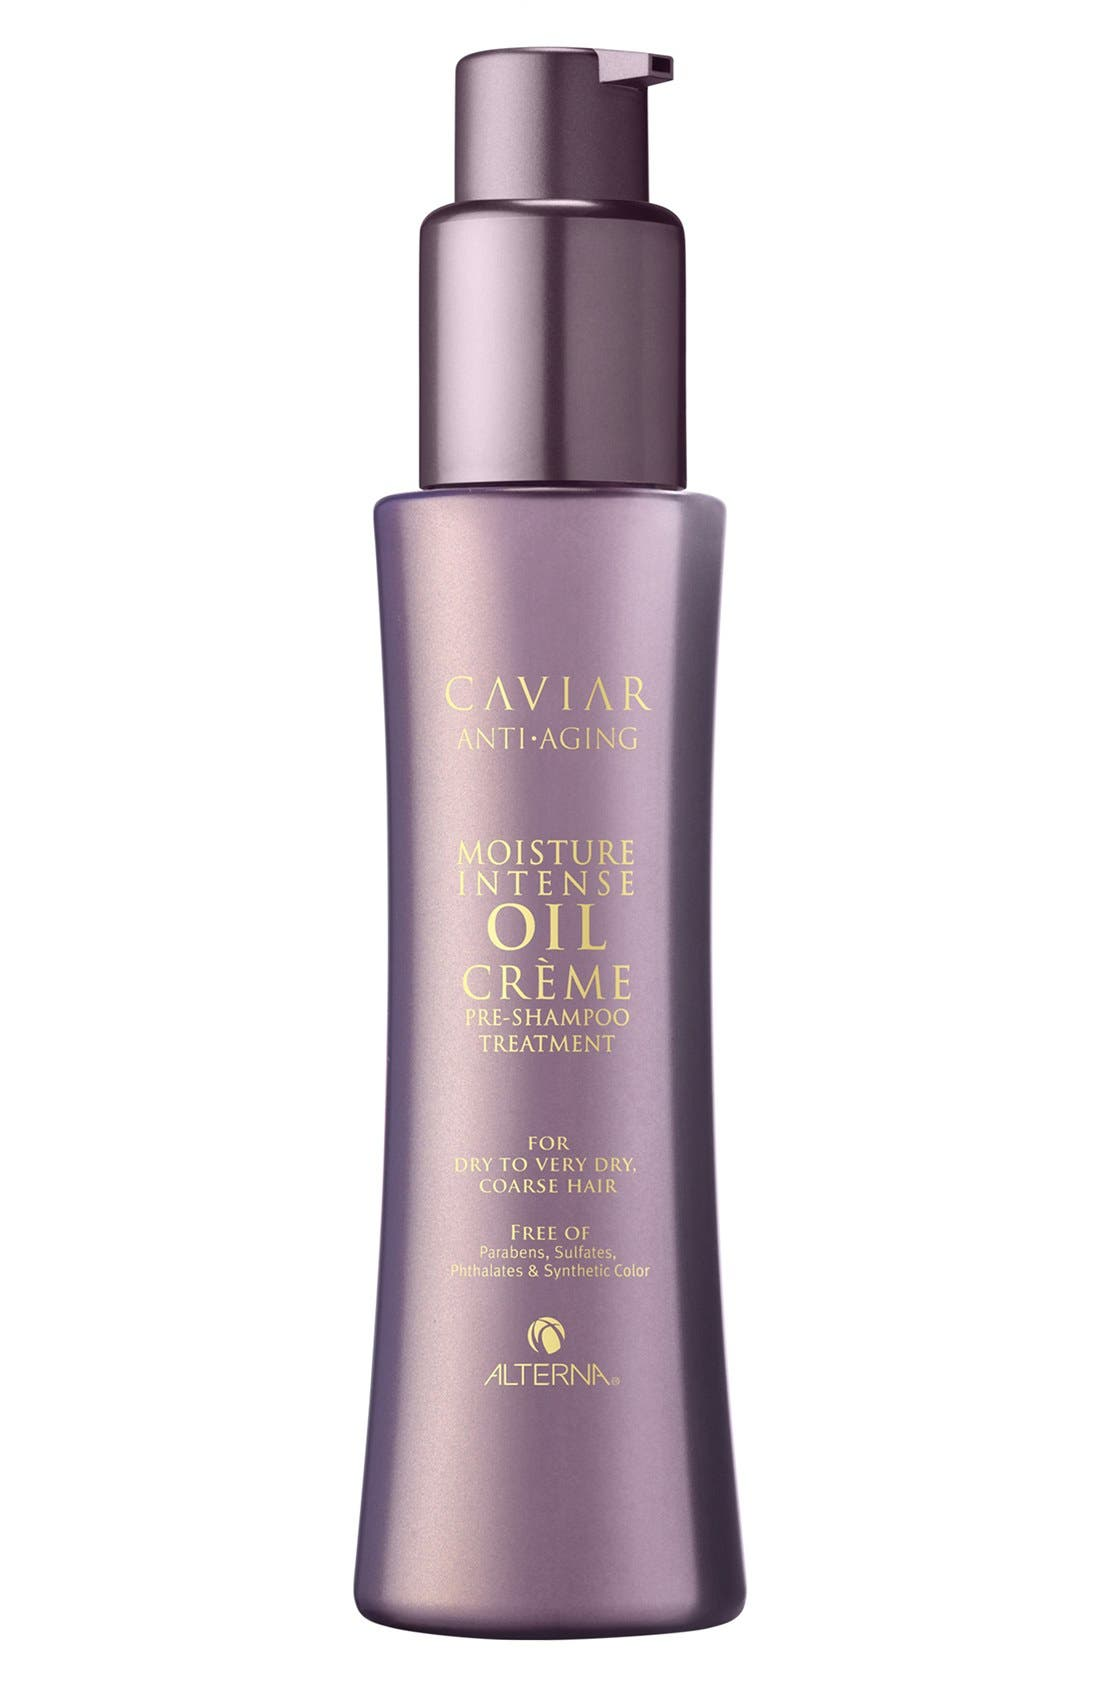 Caviar Anti-Aging Moisture Intense Oil Crème Pre-Shampoo Treatment,                             Main thumbnail 1, color,                             000